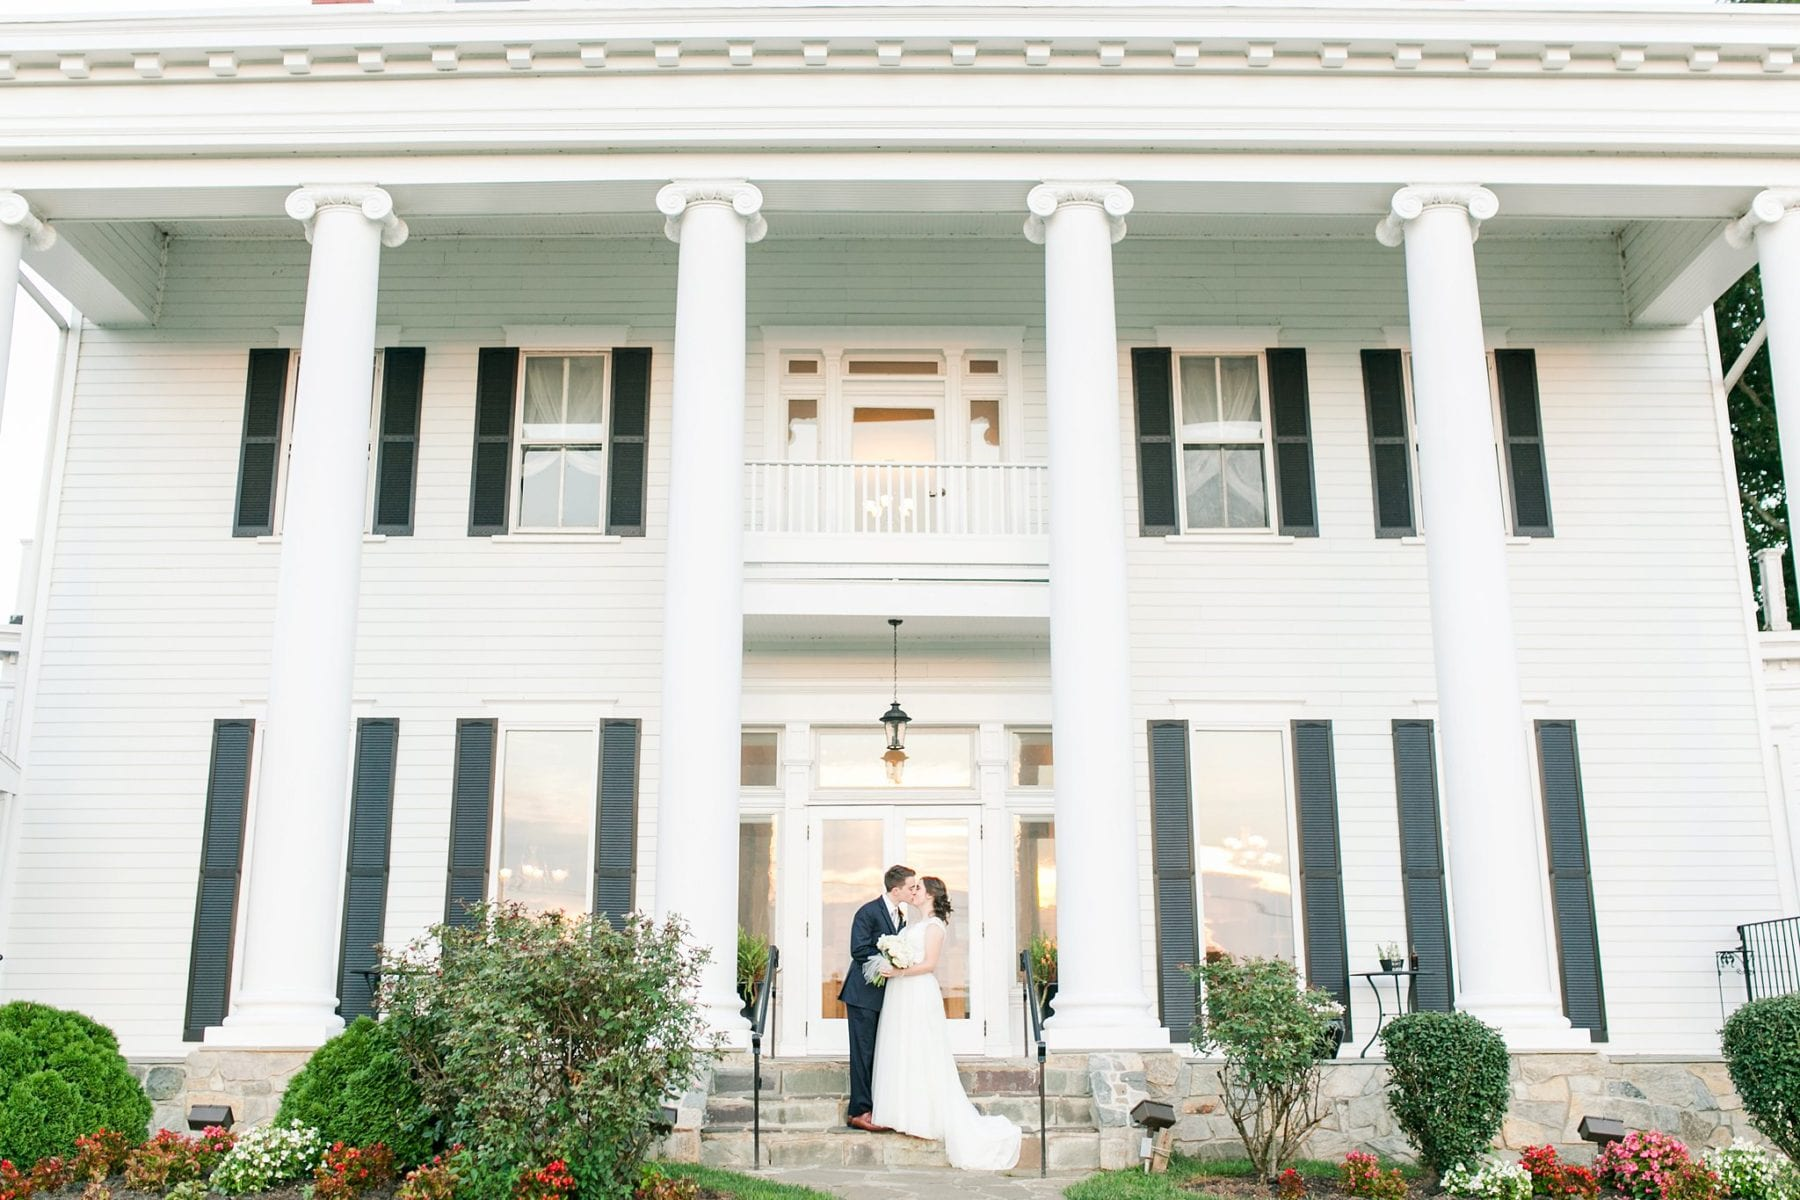 Bristow Manor Wedding Photos Virginia Wedding Photographer Lauren & Andrew Megan Kelsey Photography-604.jpg